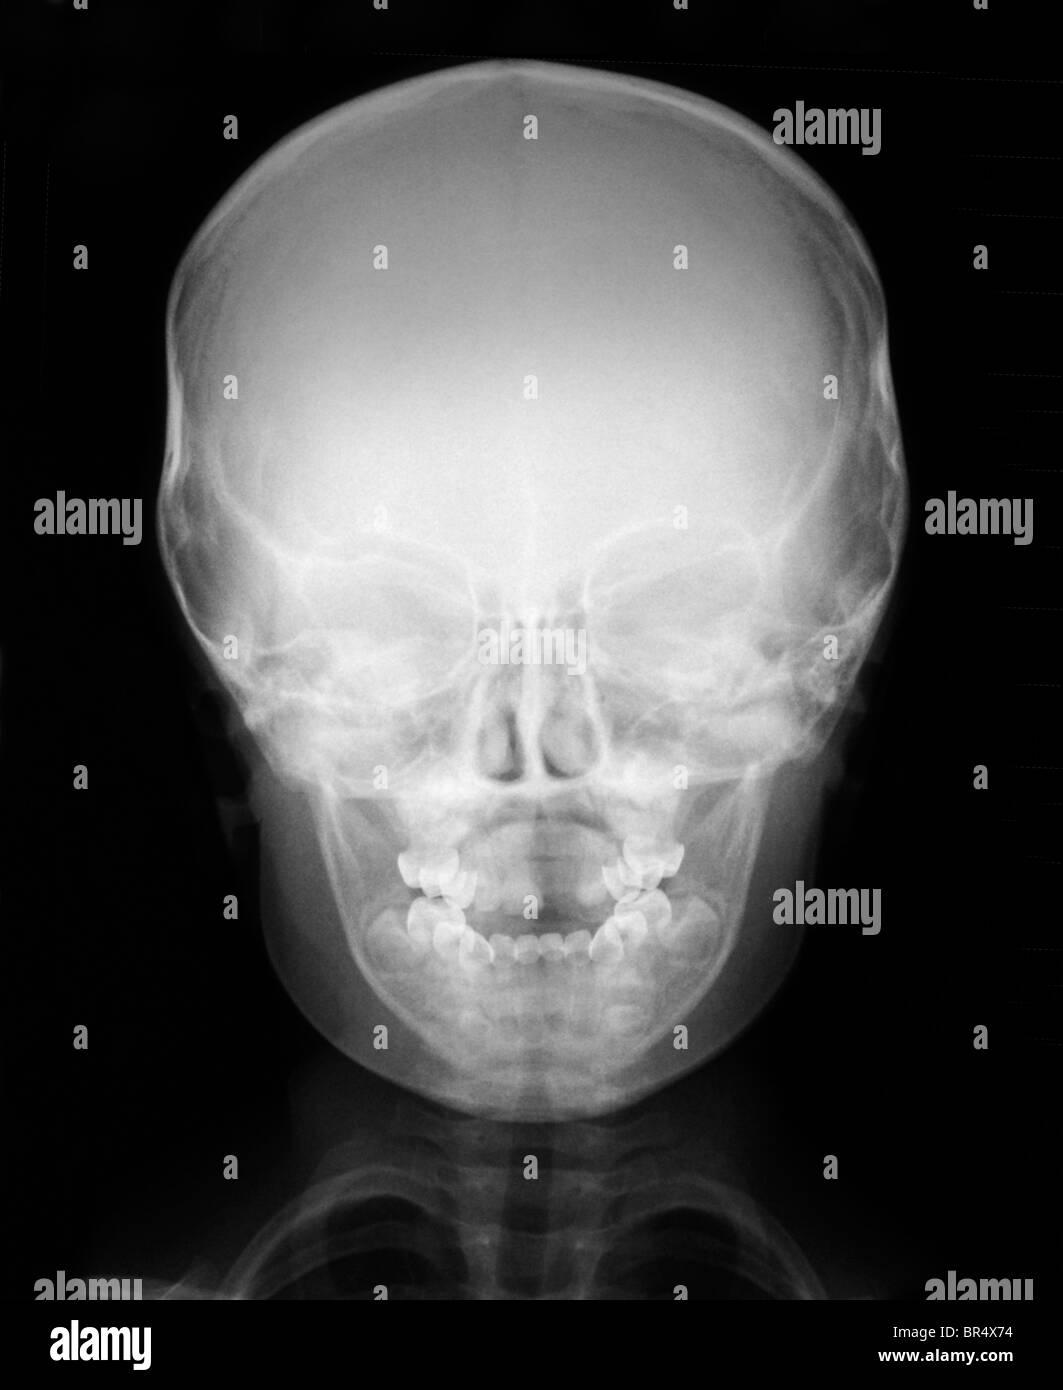 Normal Skull X Ray Stock Photos Amp Normal Skull X Ray Stock